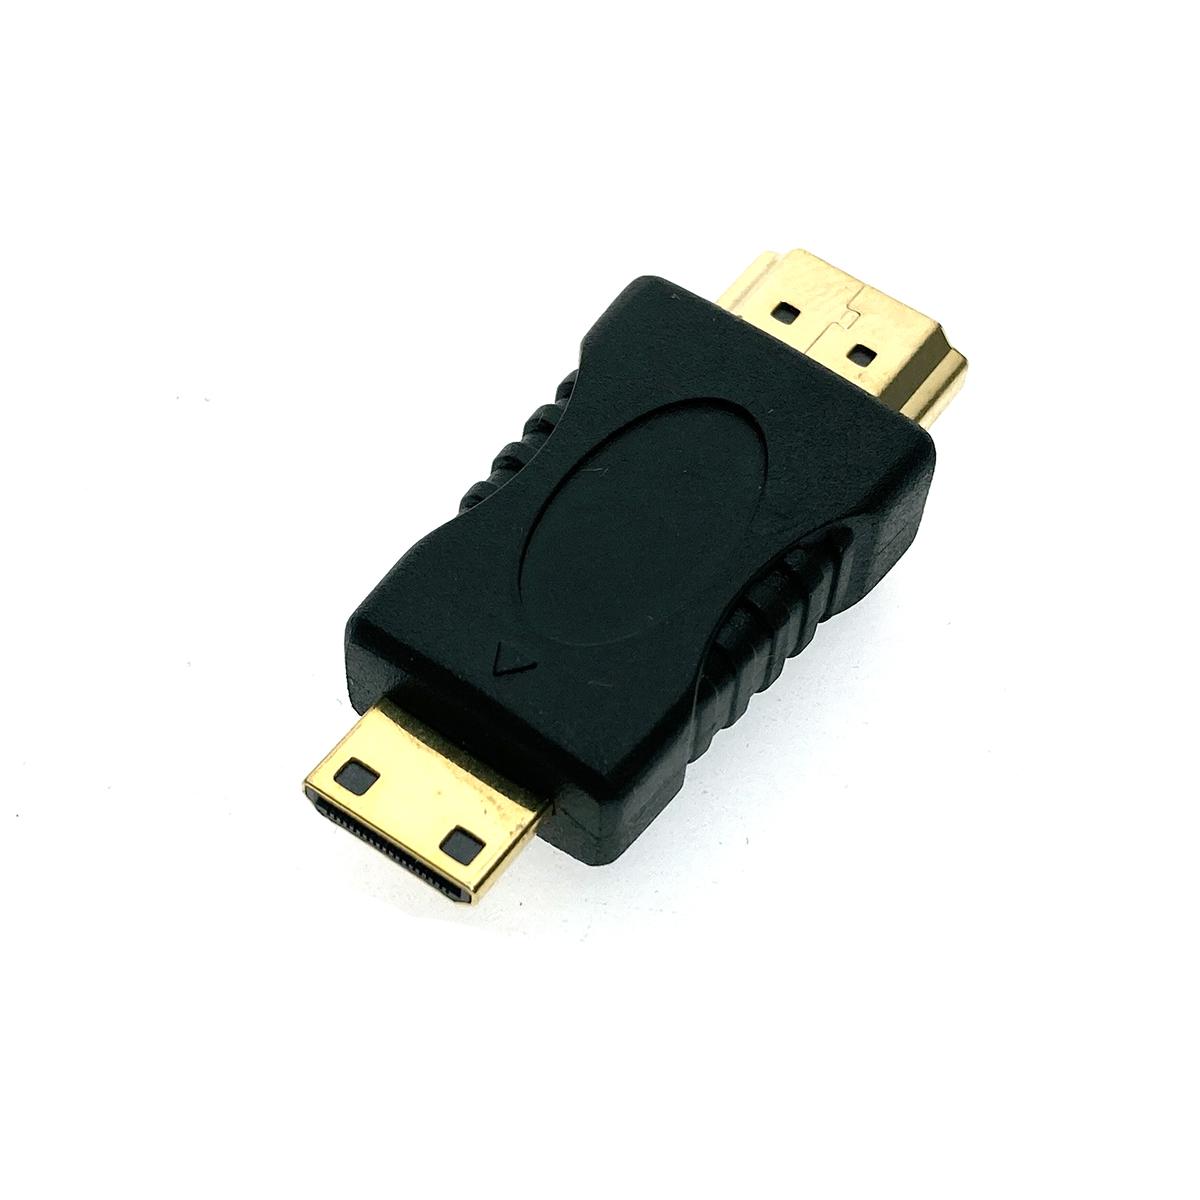 Переходник HDMI male to mini HDMI male Espada